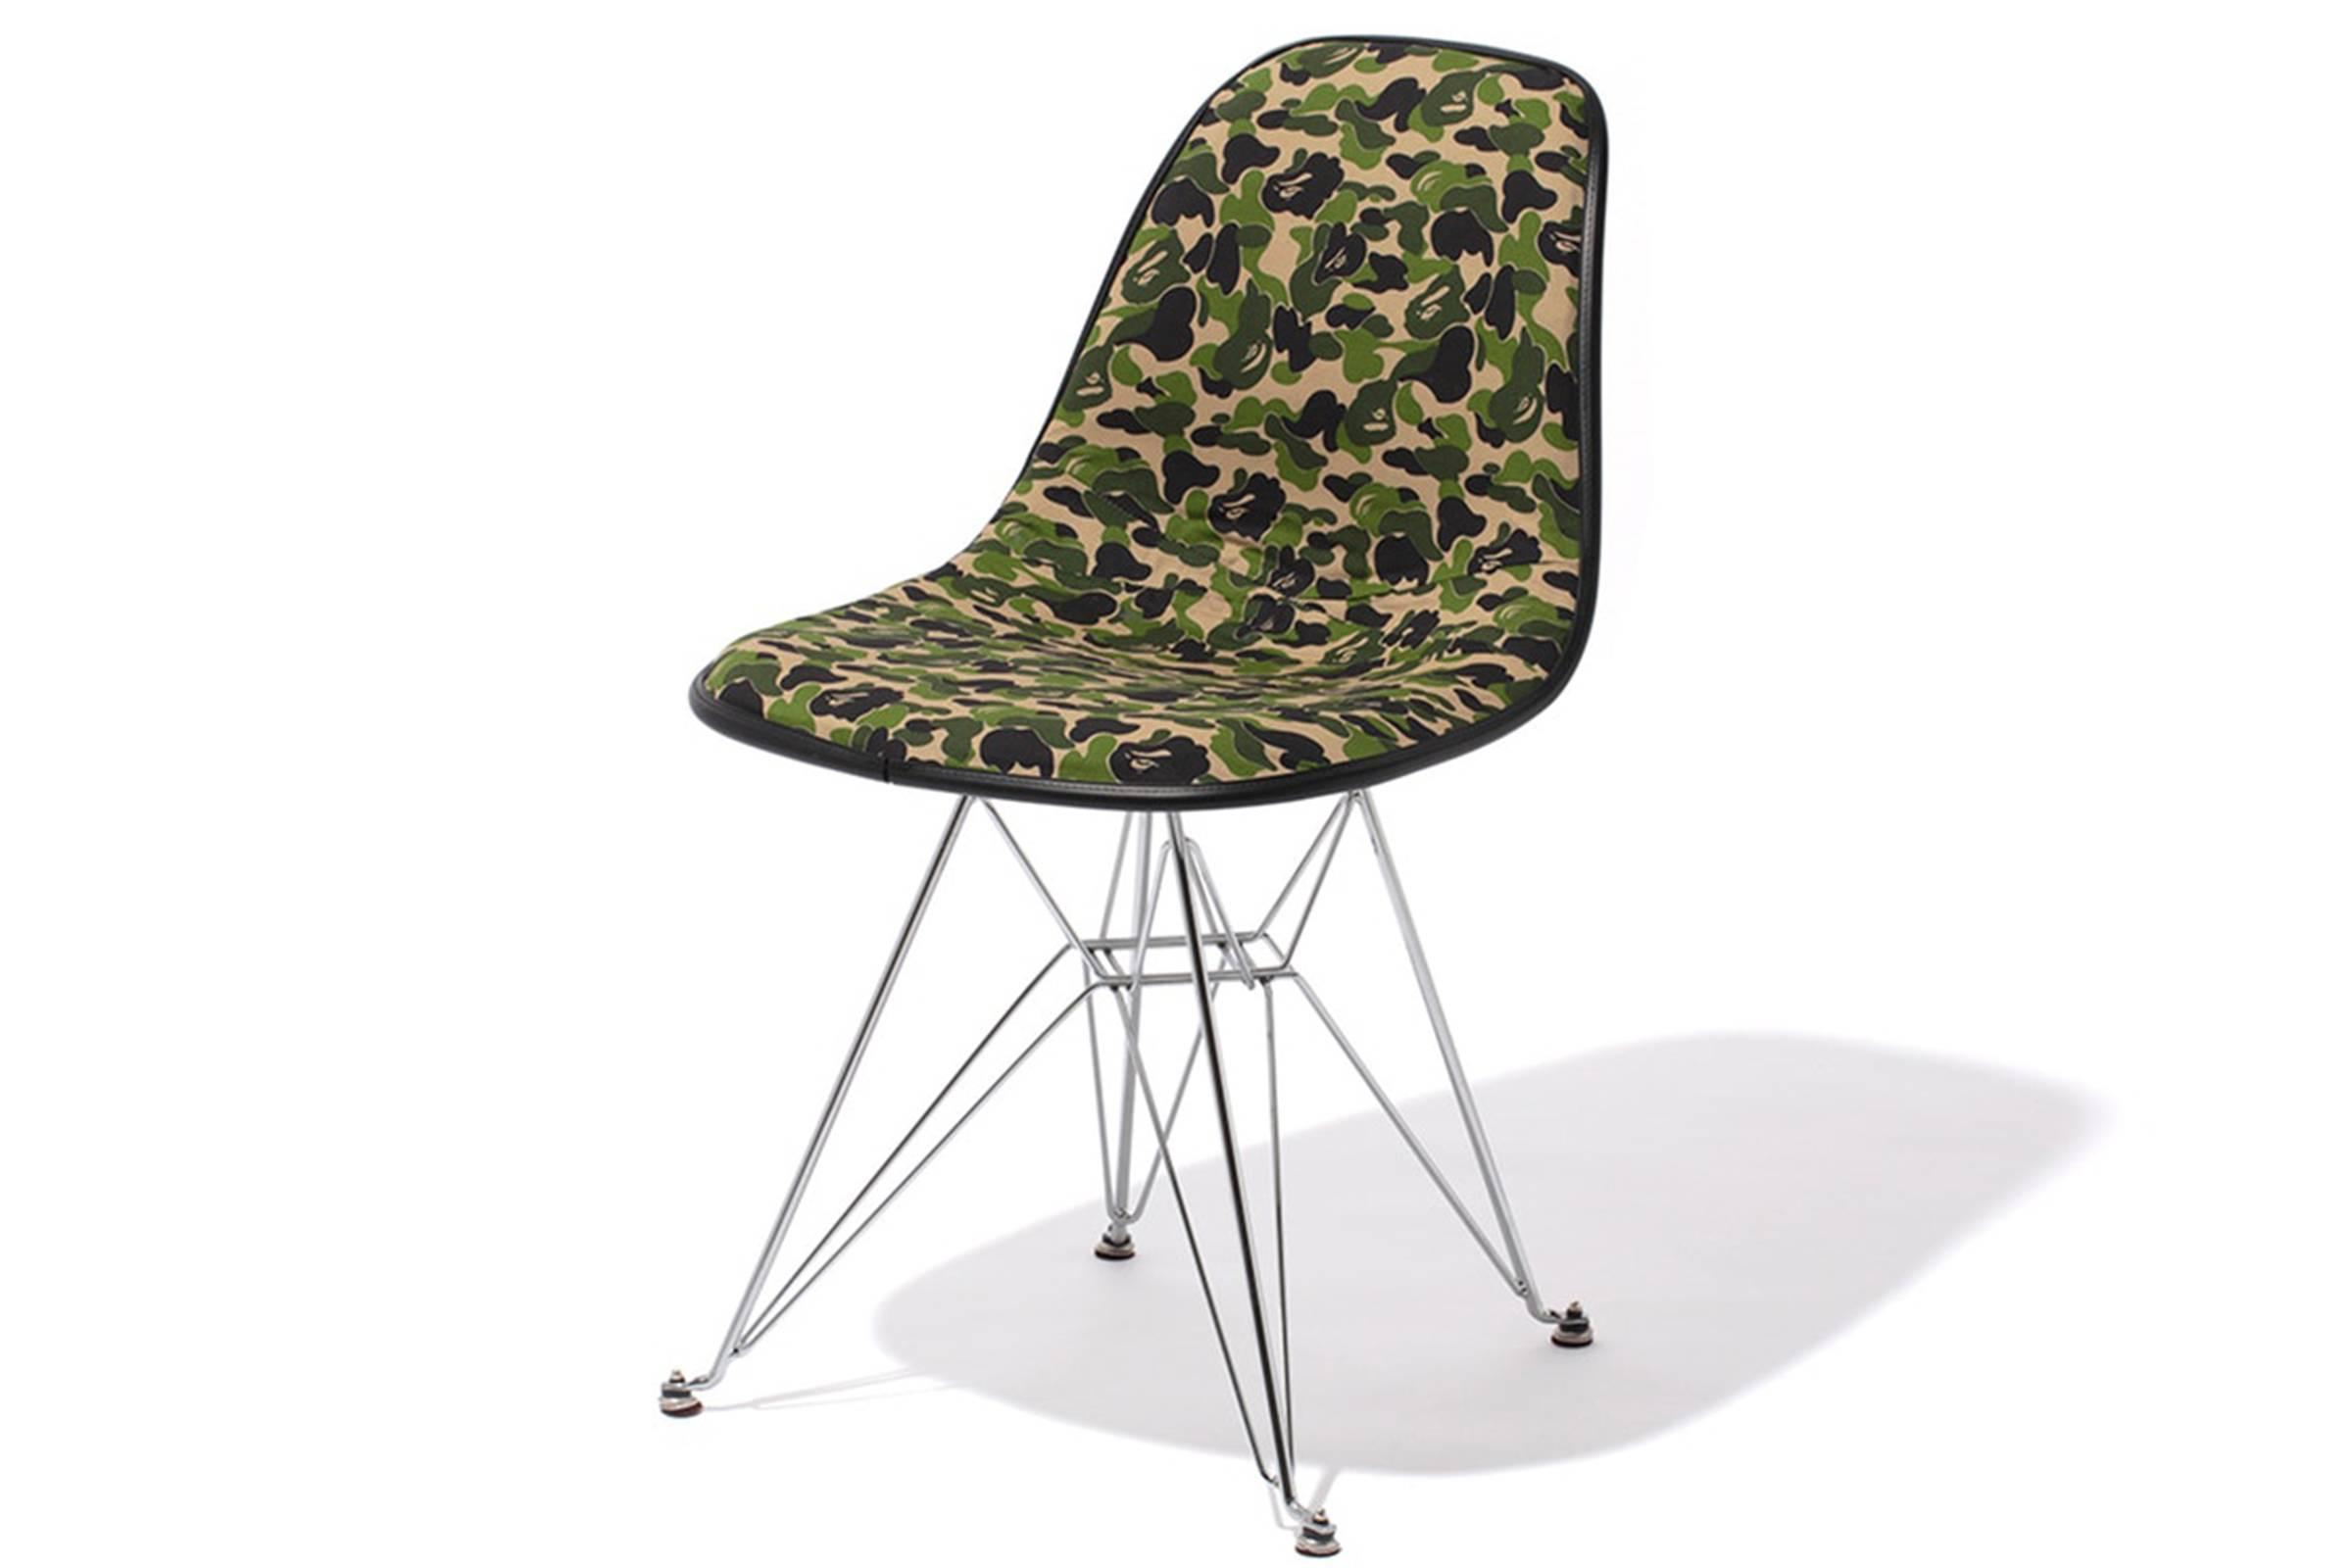 Bape x Modernica Chairs